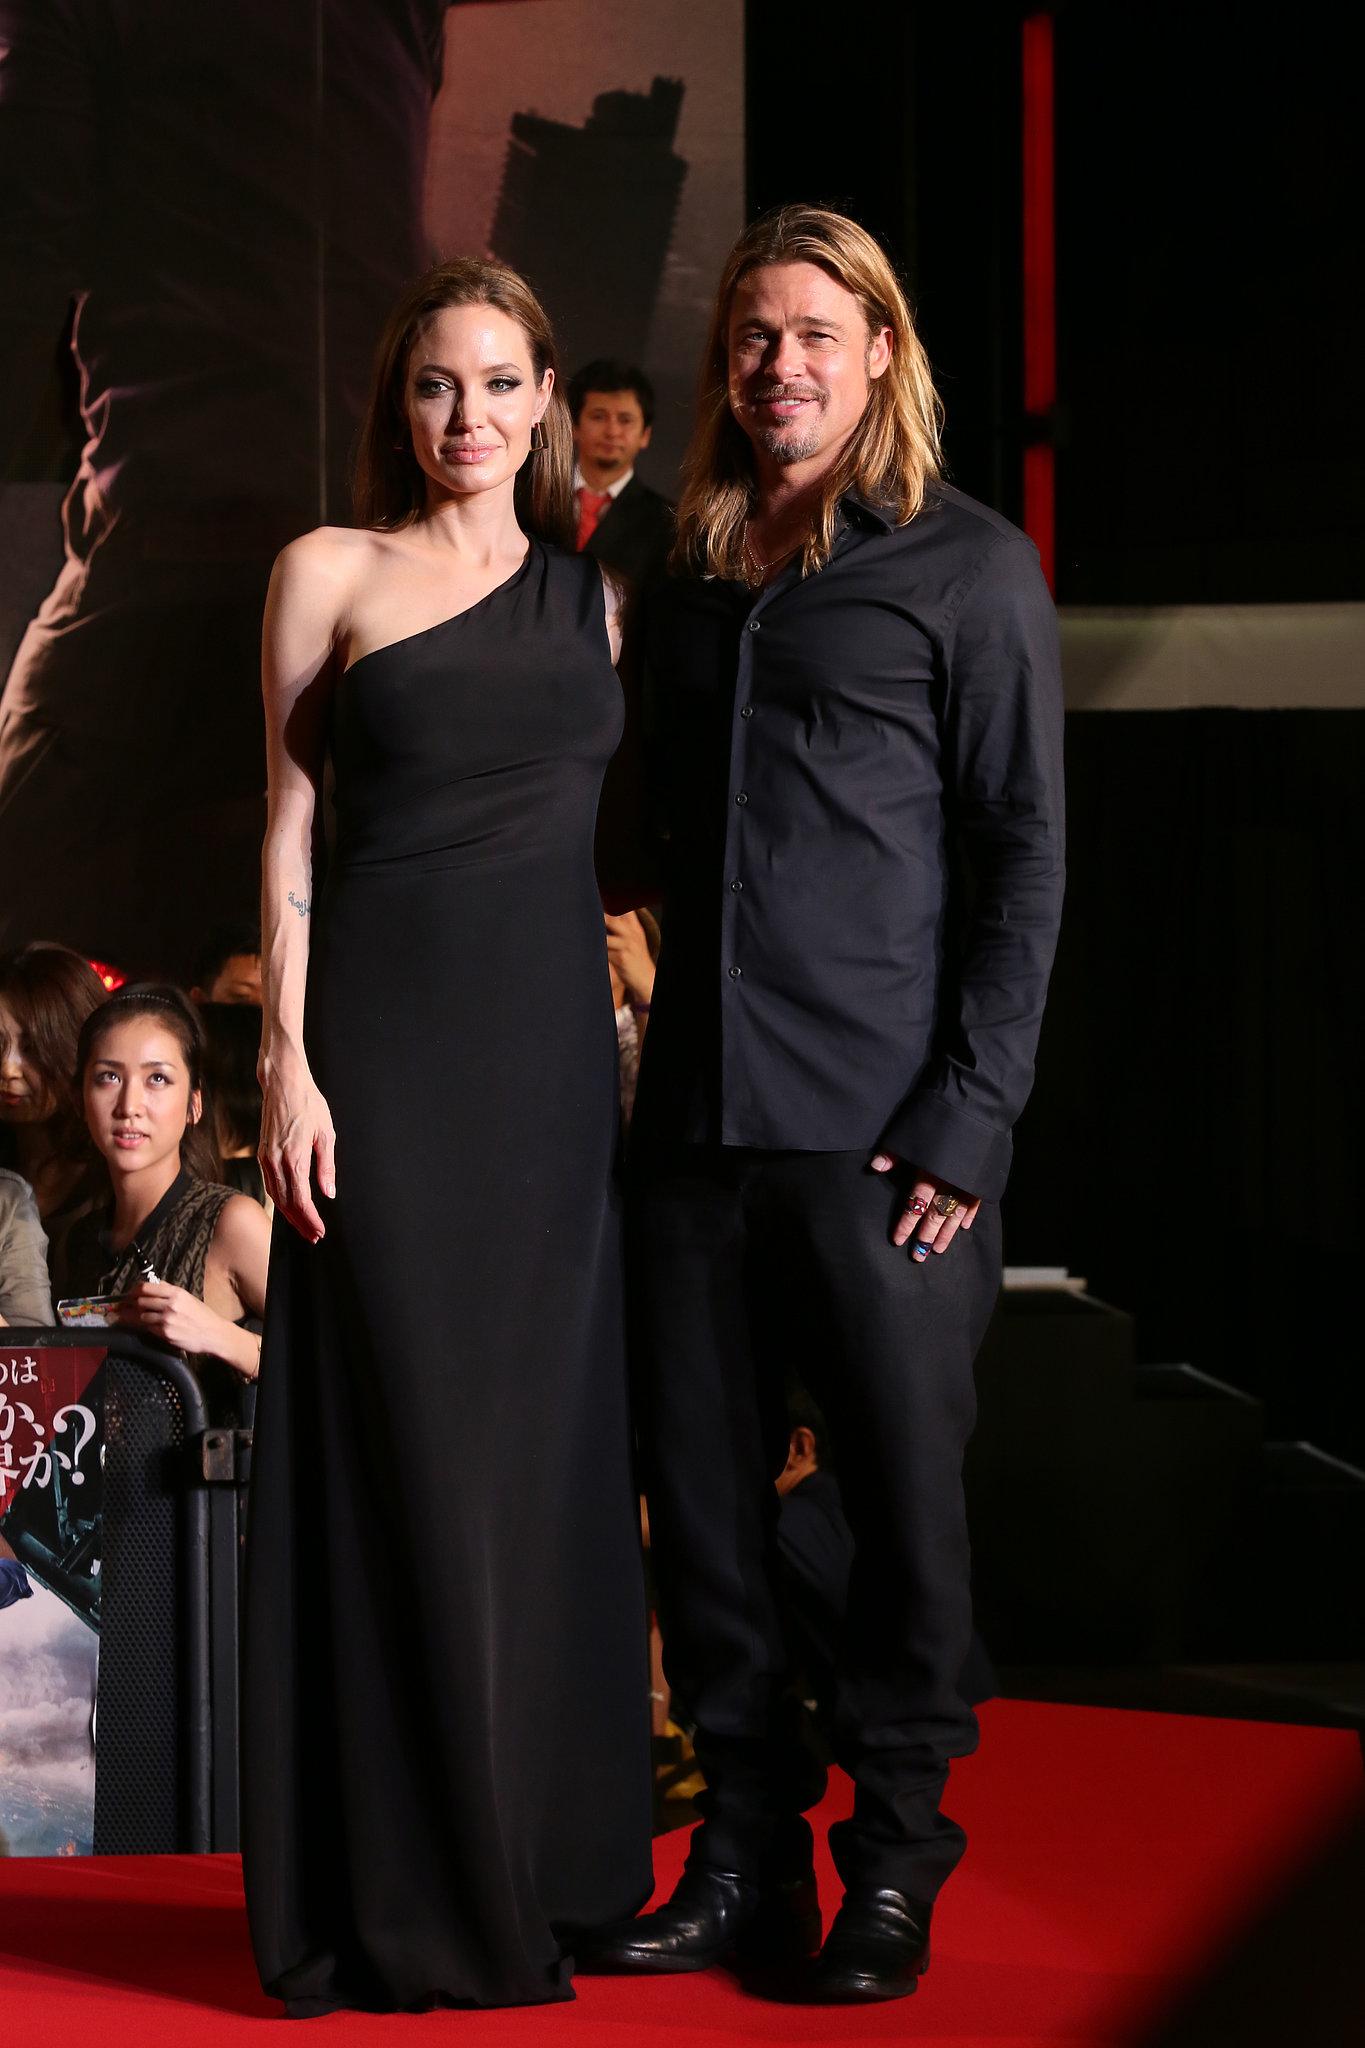 Angelina Jolie and Brad Pitt premiered World War Z in Tokyo on Monday.